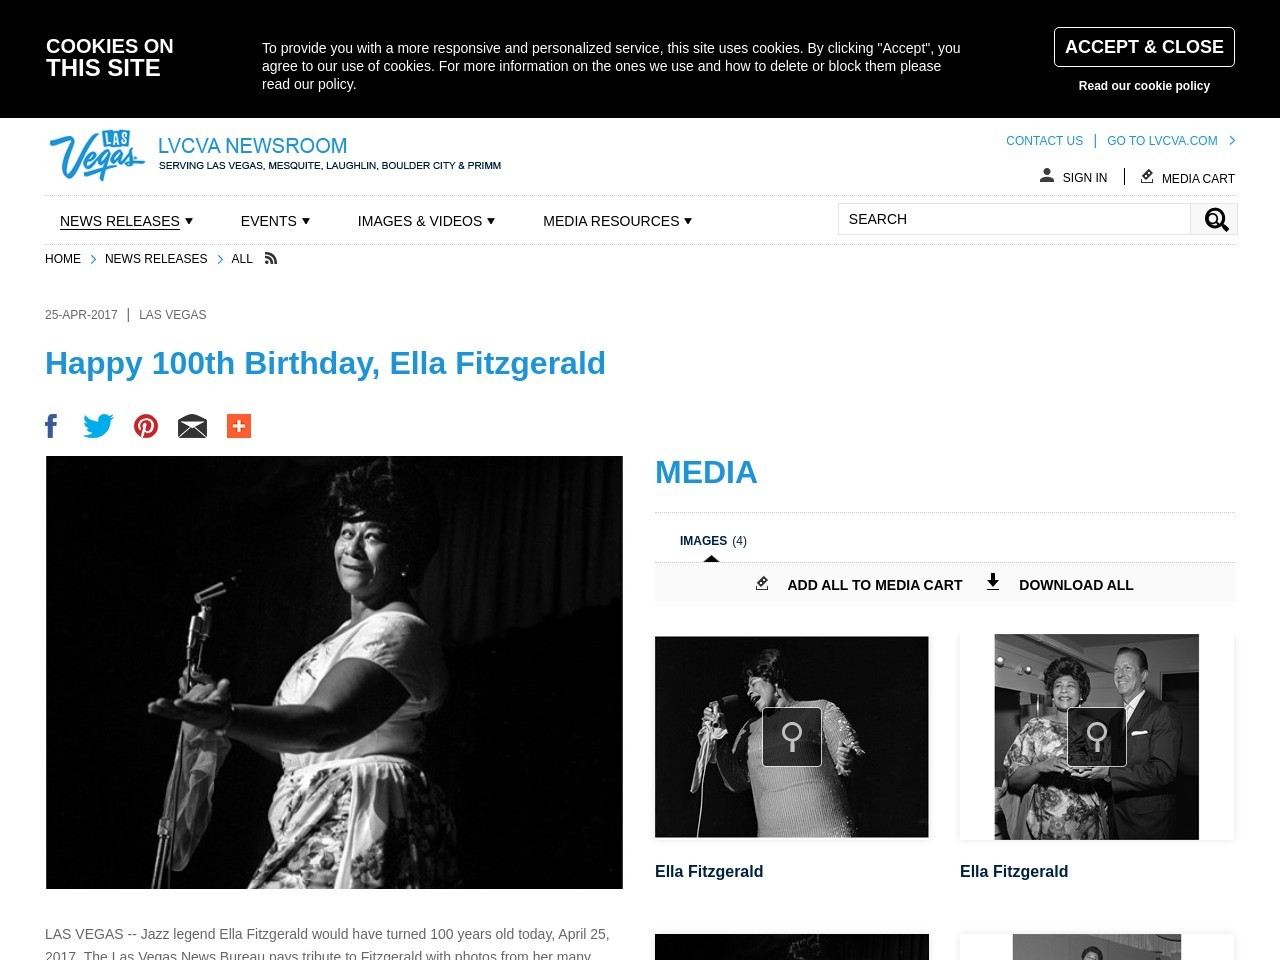 Happy 100th Birthday, Ella Fitzgerald